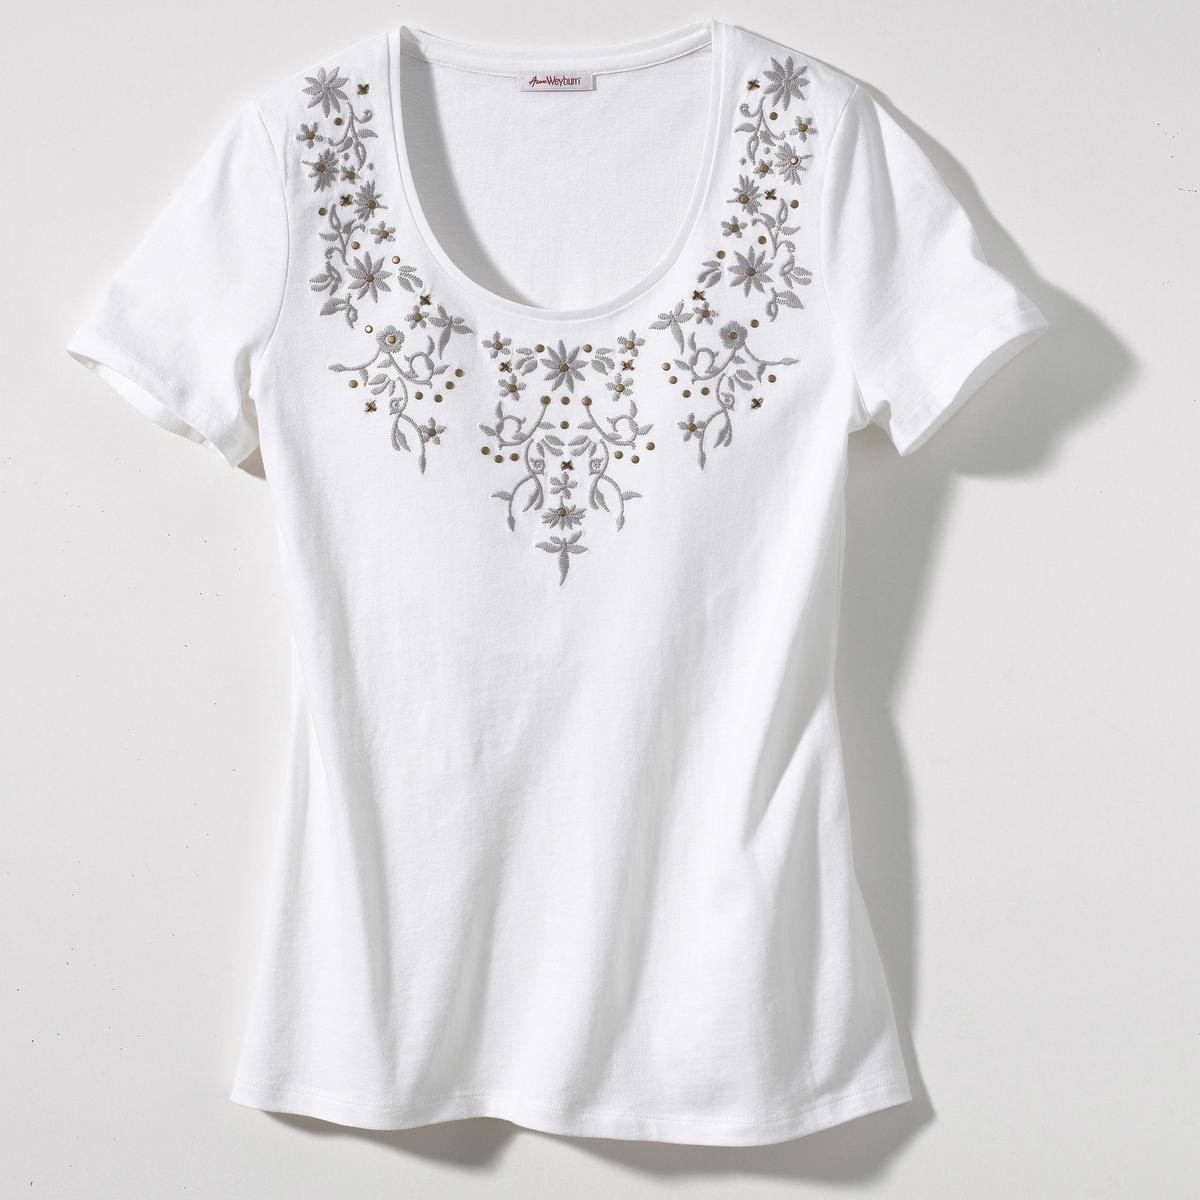 T-shirt bordada, mangas curtas